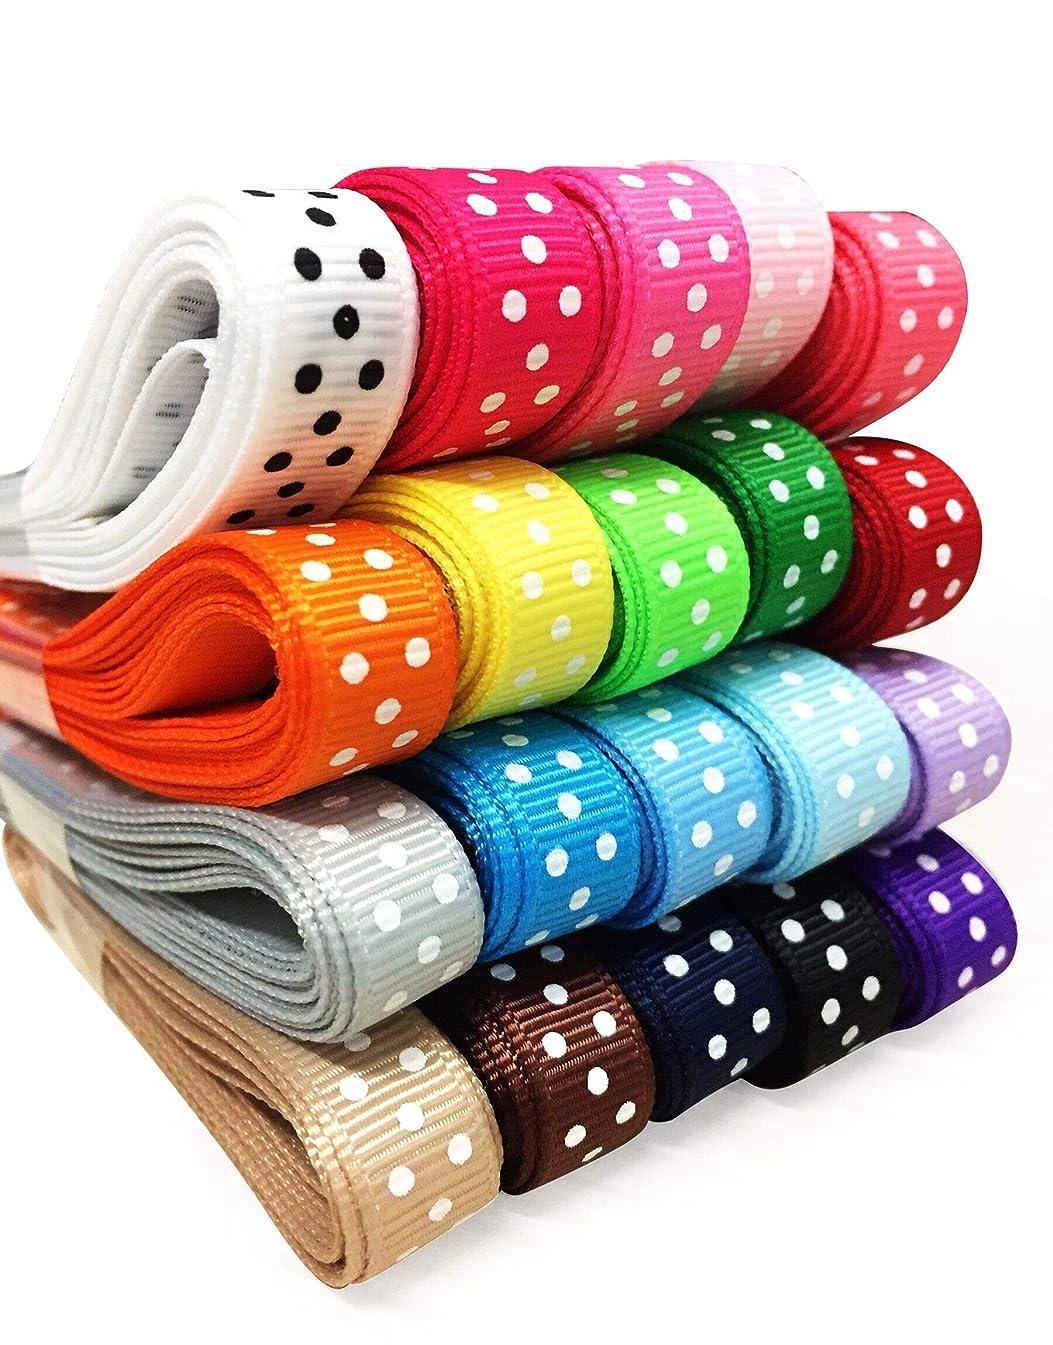 YAMA Polka Dot Grosgrain Ribbons Set - 3/8'' 40 Yards Ribbon Wrapping, Hair Bow Accessories DIY, 20x2yd Swiss Dot Fabric Ribbon